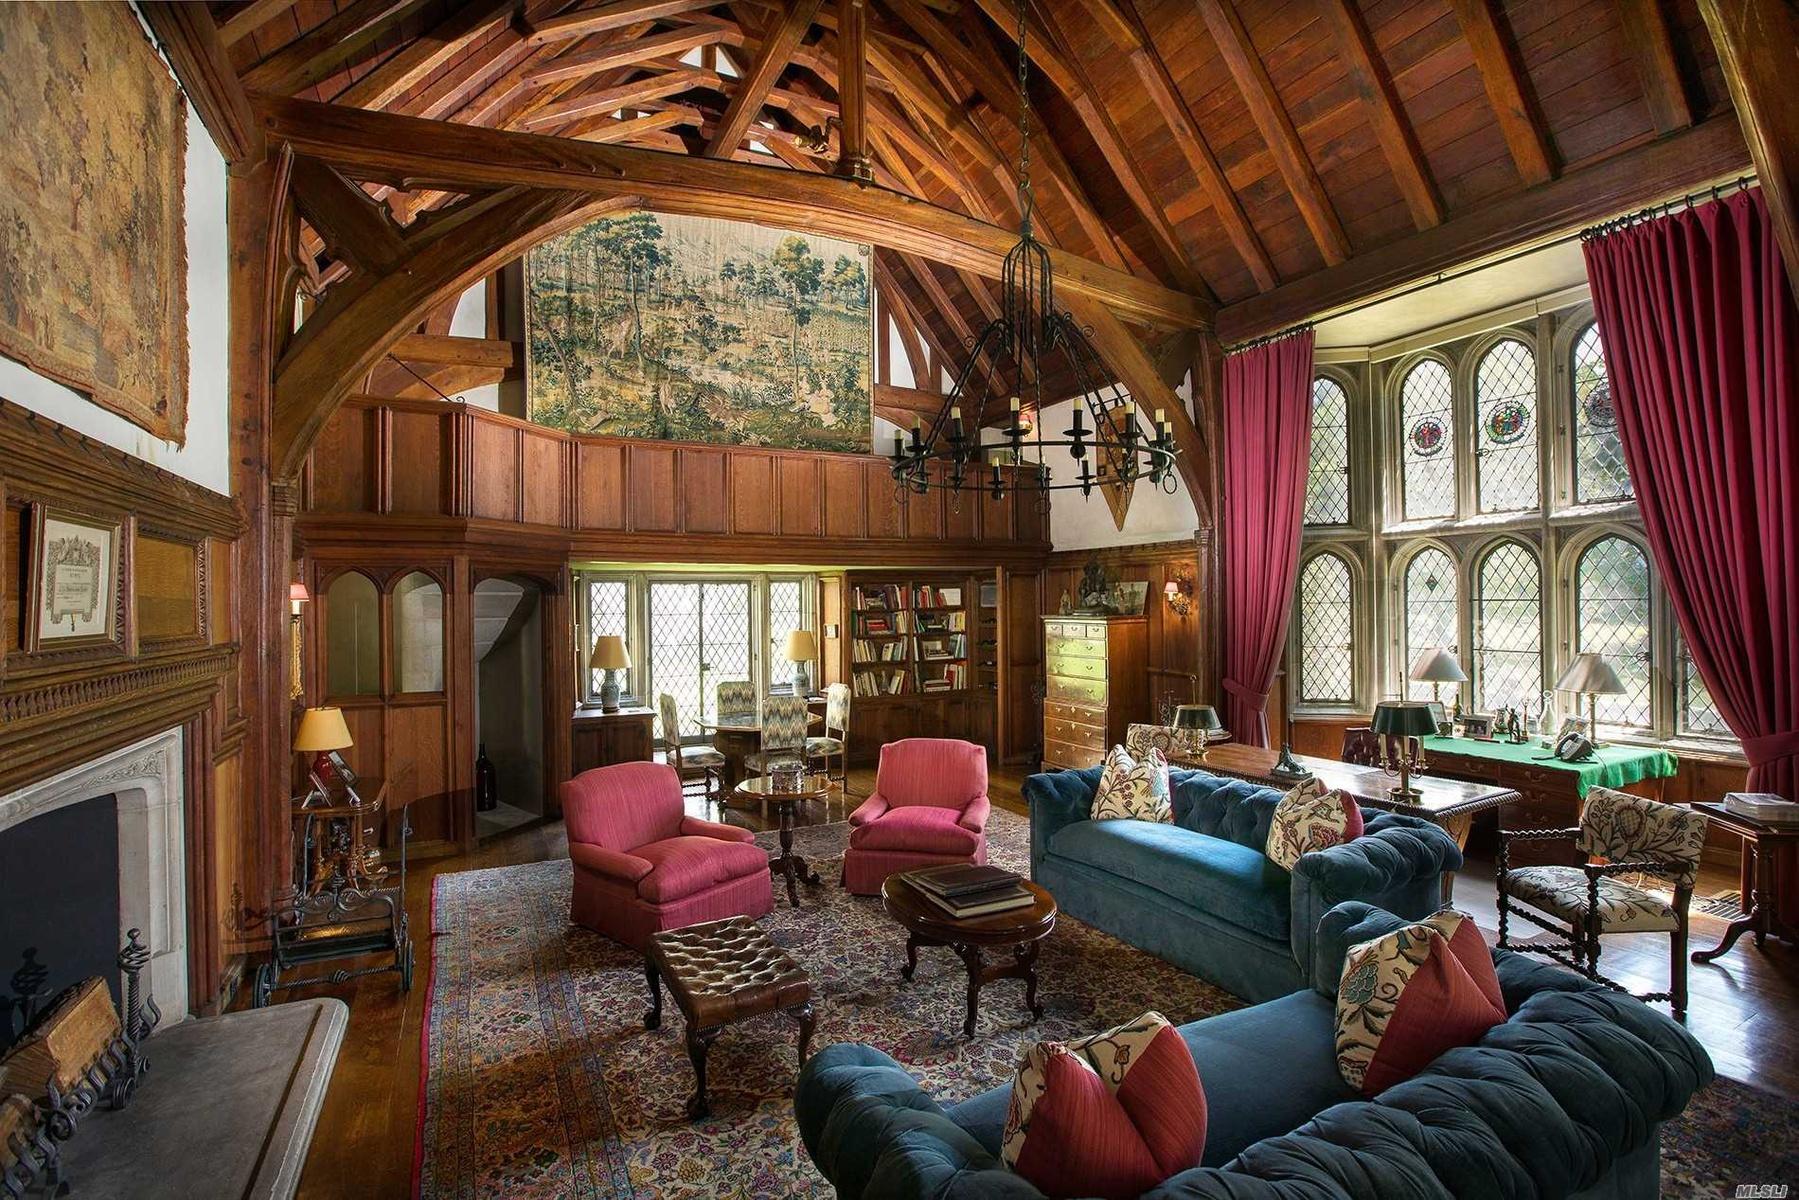 Exquisite Library